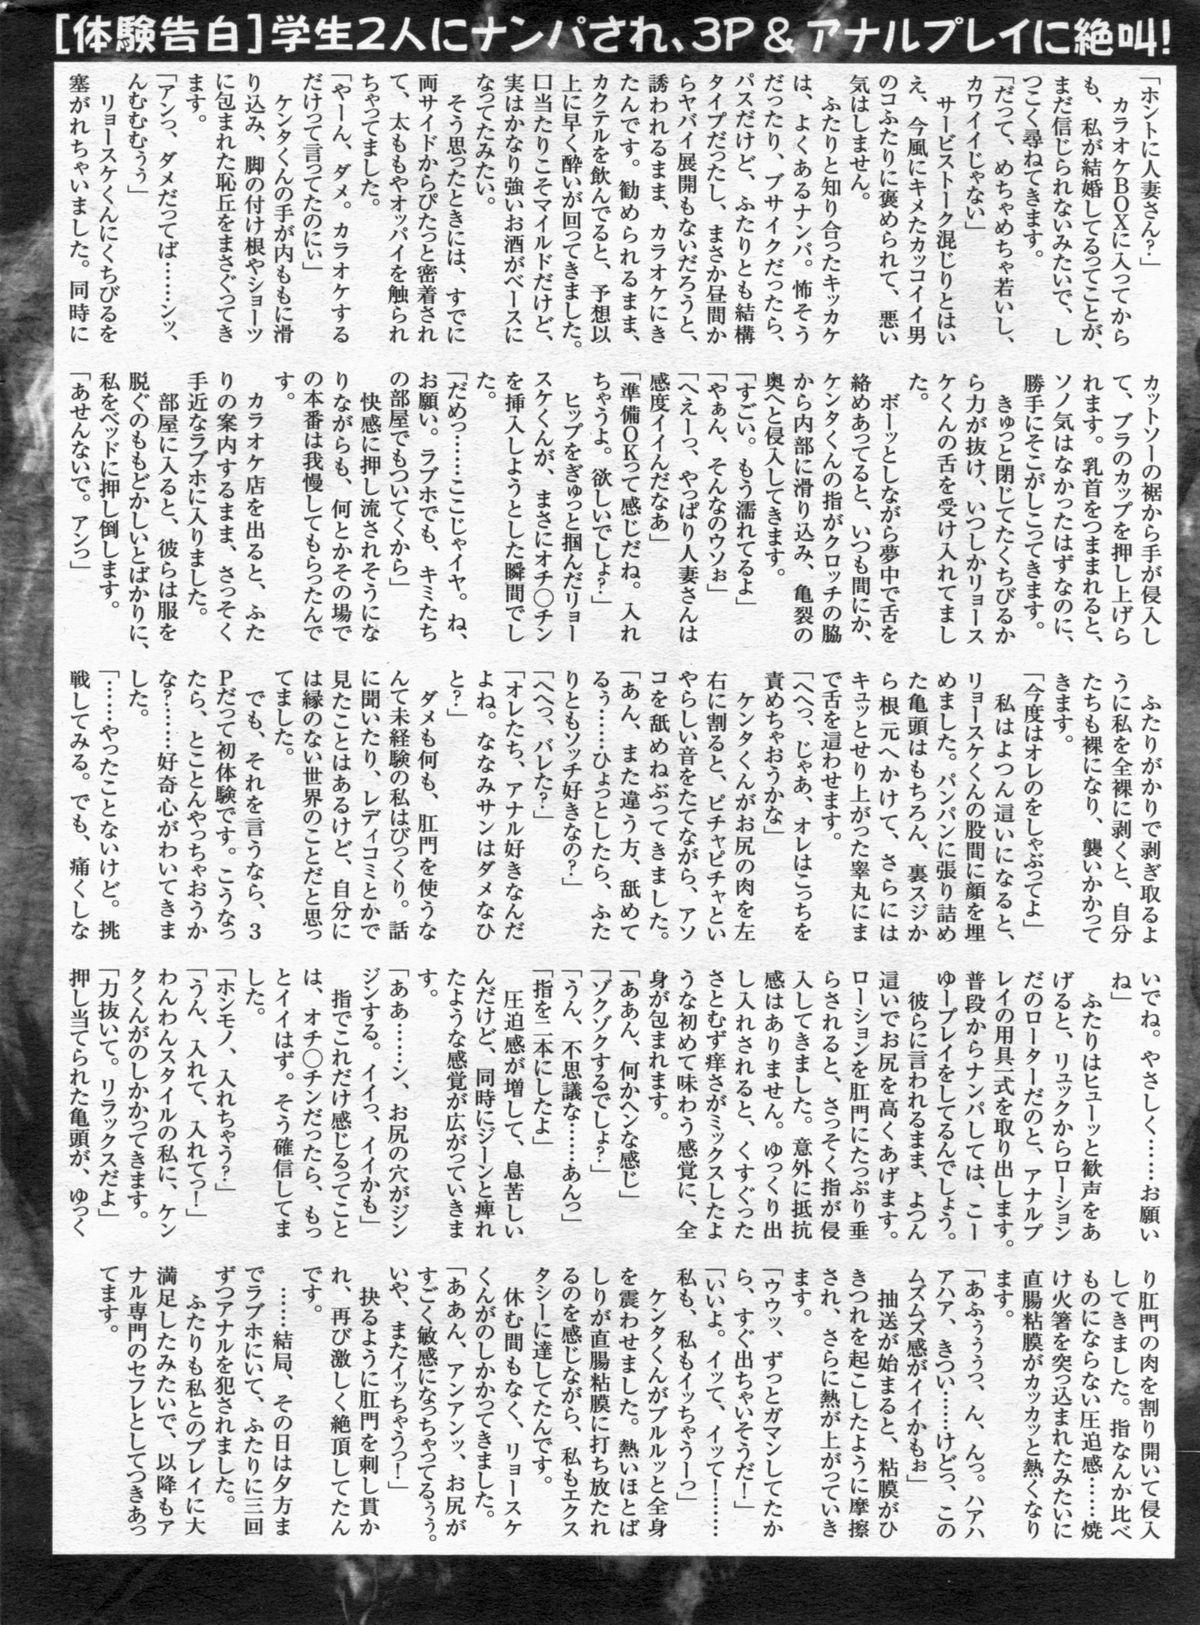 Manga Bon 2013-02 171